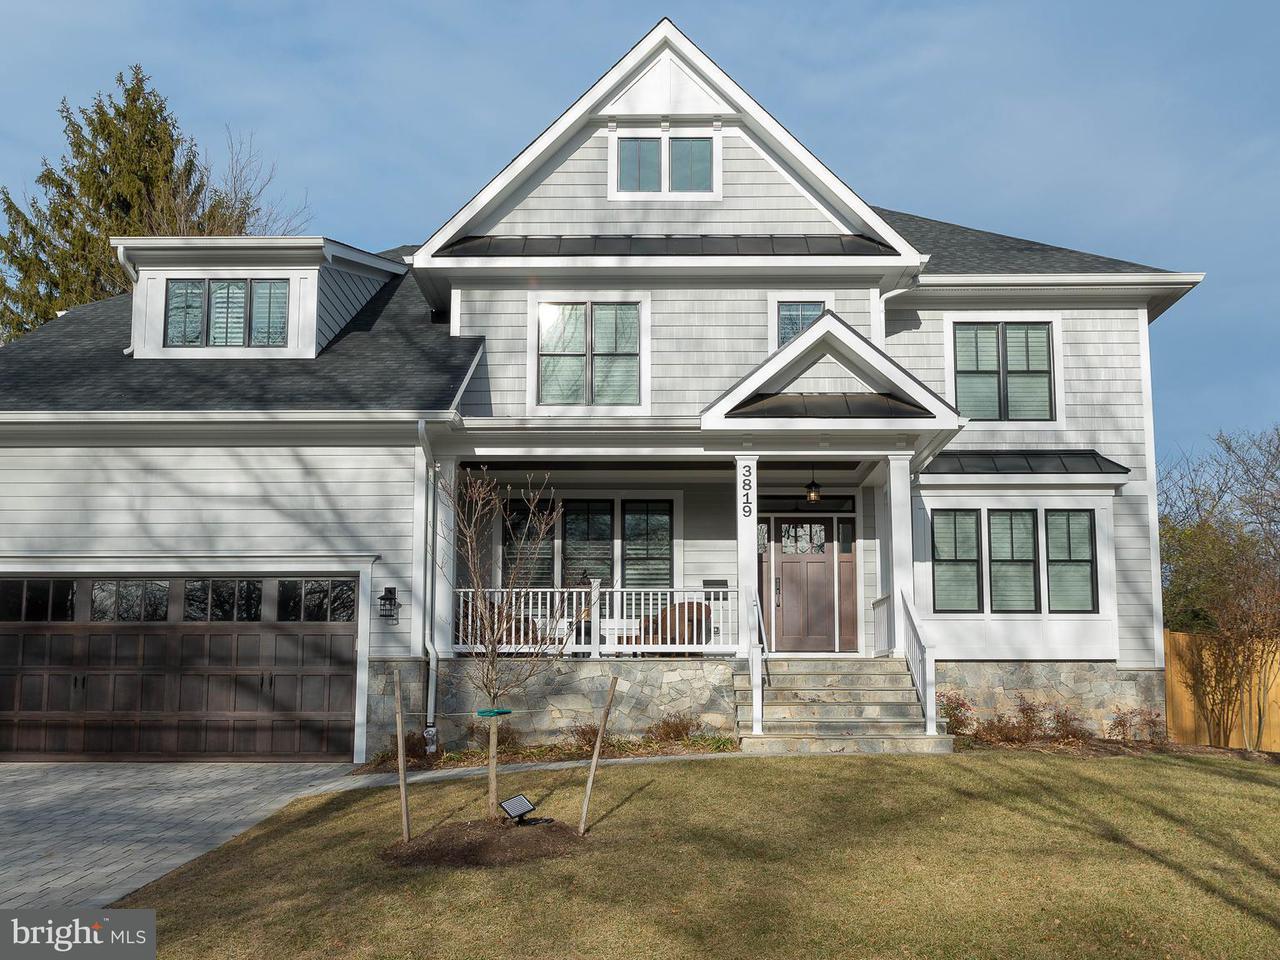 Single Family Home for Sale at 3819 Dittmar Road 3819 Dittmar Road Arlington, Virginia 22207 United States